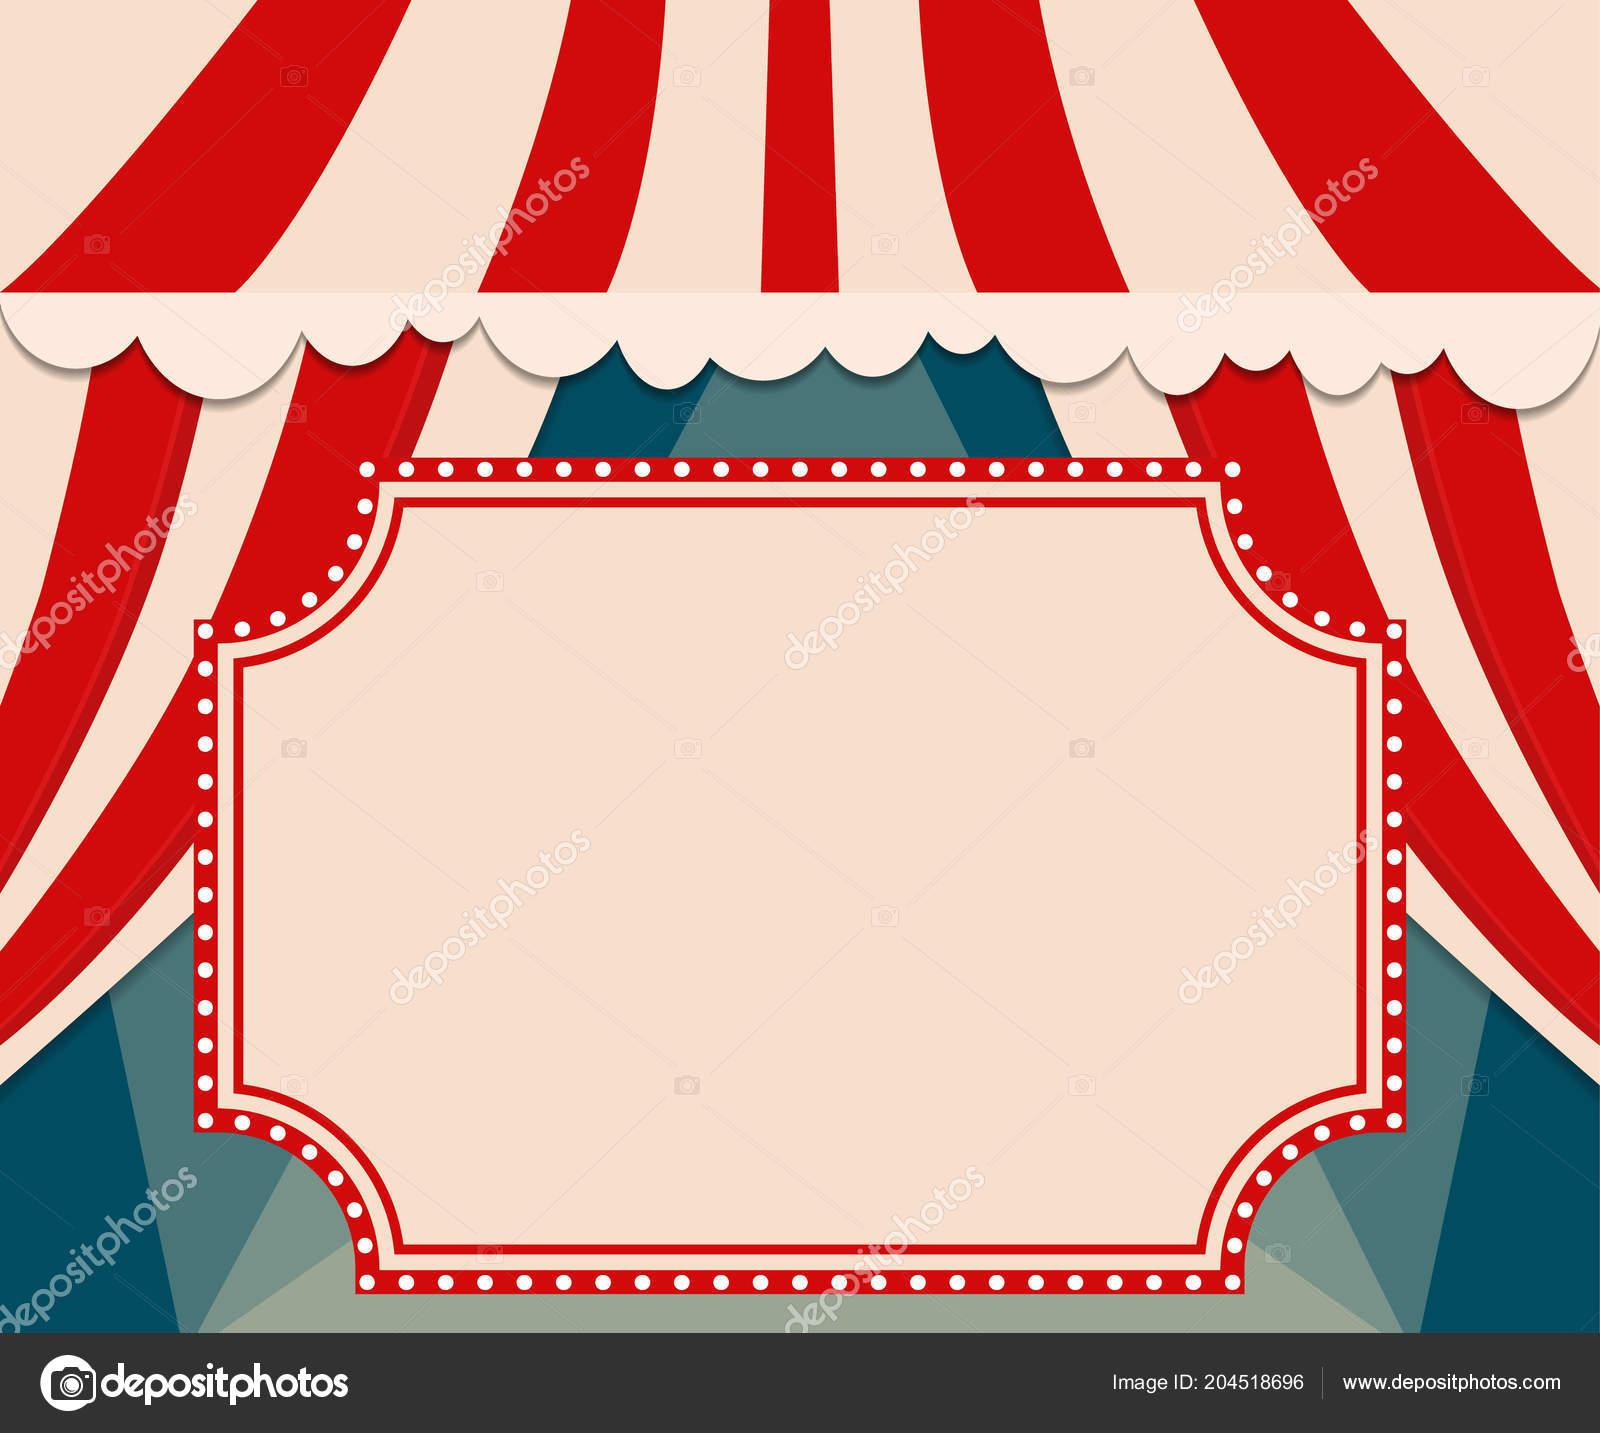 poster template retro circus banner design presentation concert show